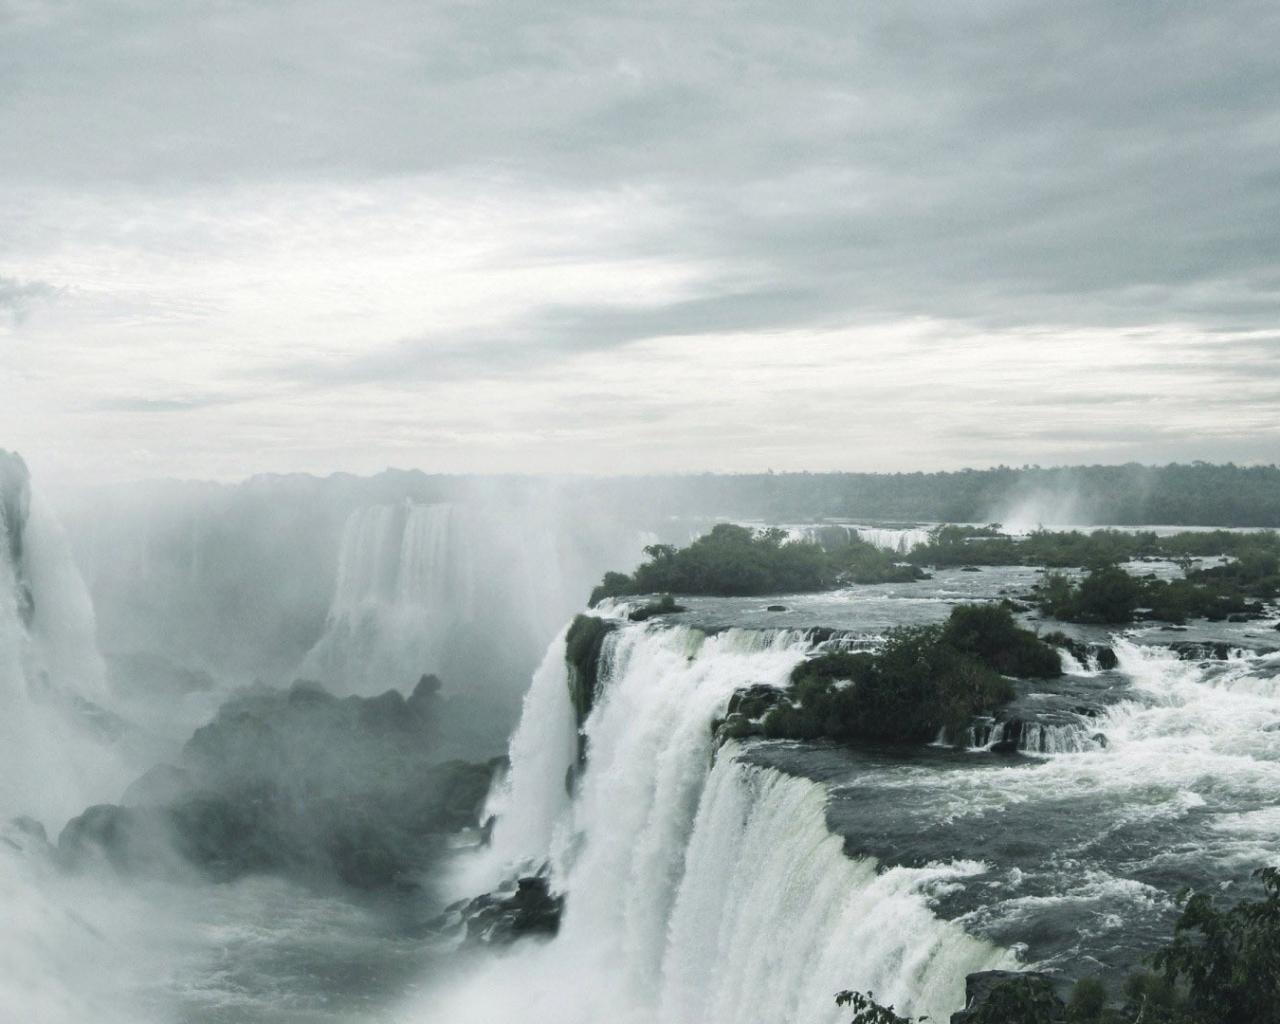 Niagara Falls Canada 1280x1024